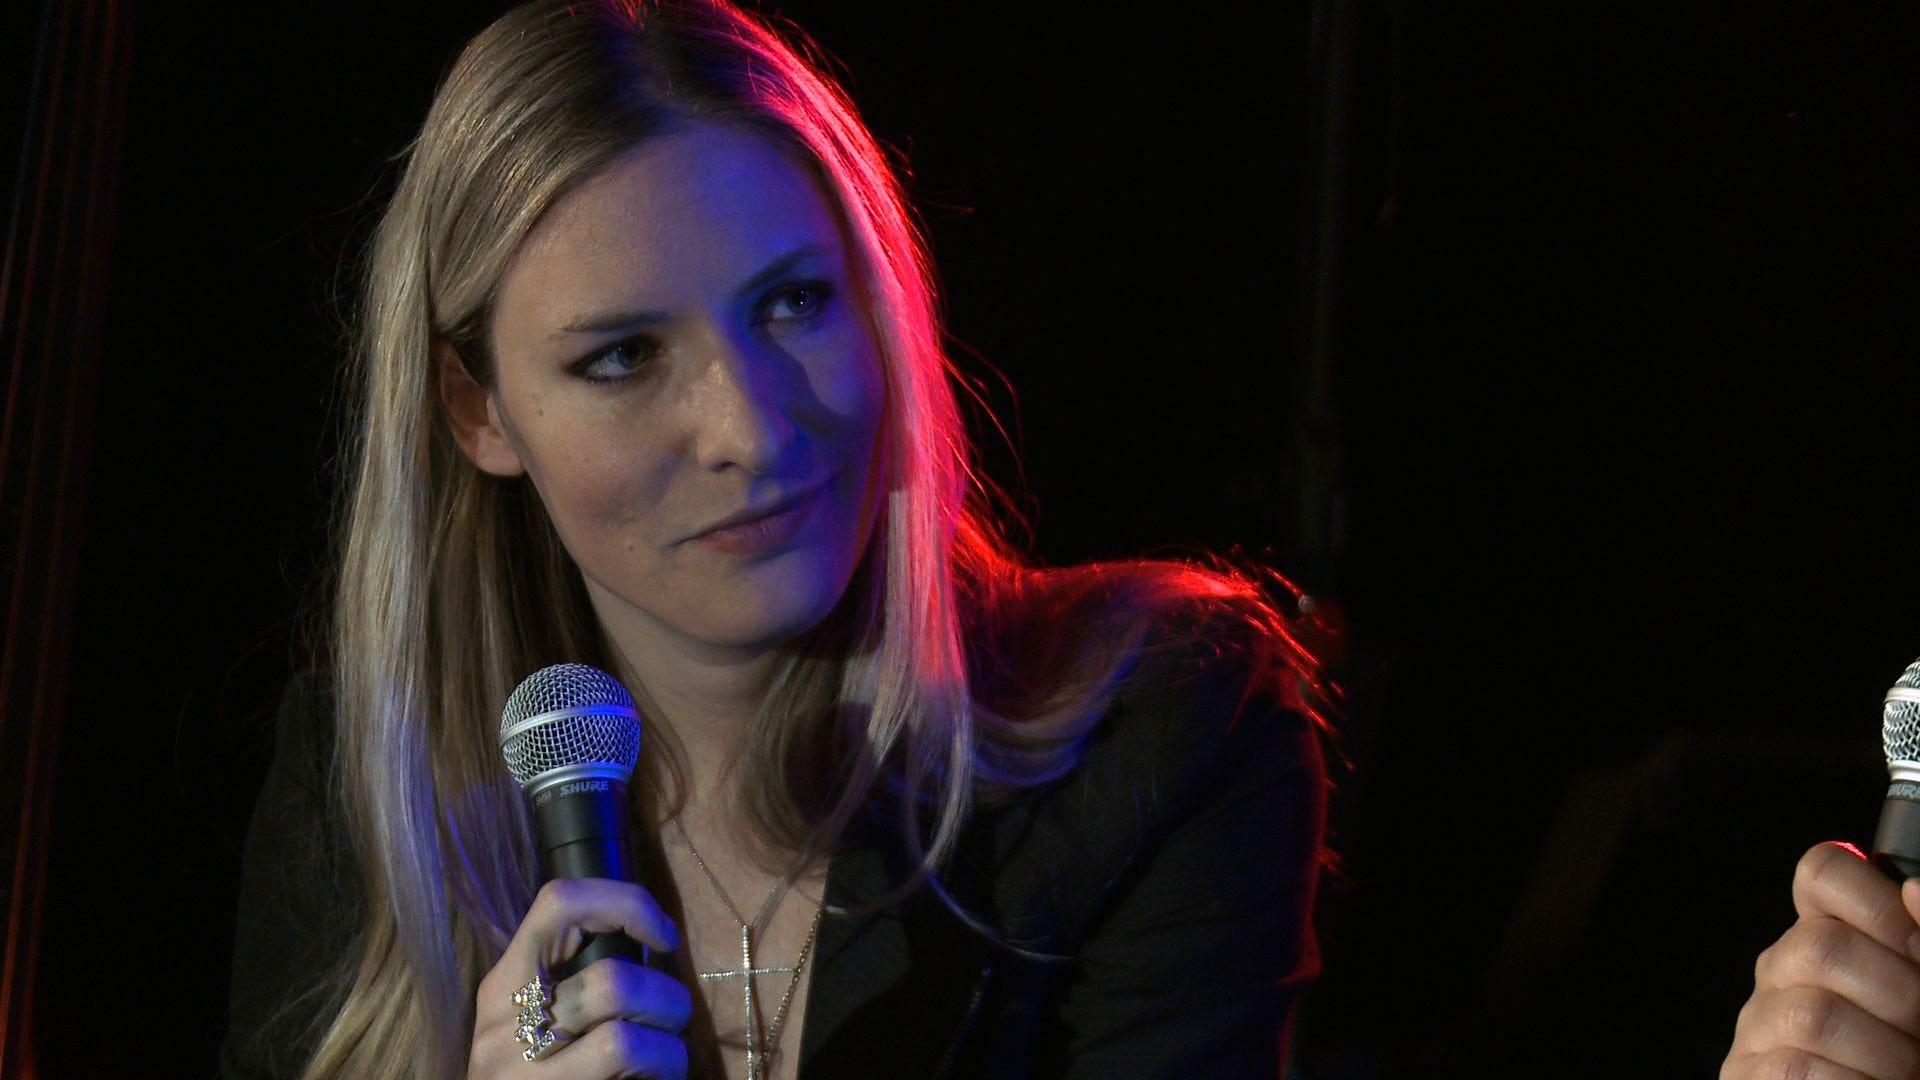 Studioa S Featured Artist Singer Holly Williams